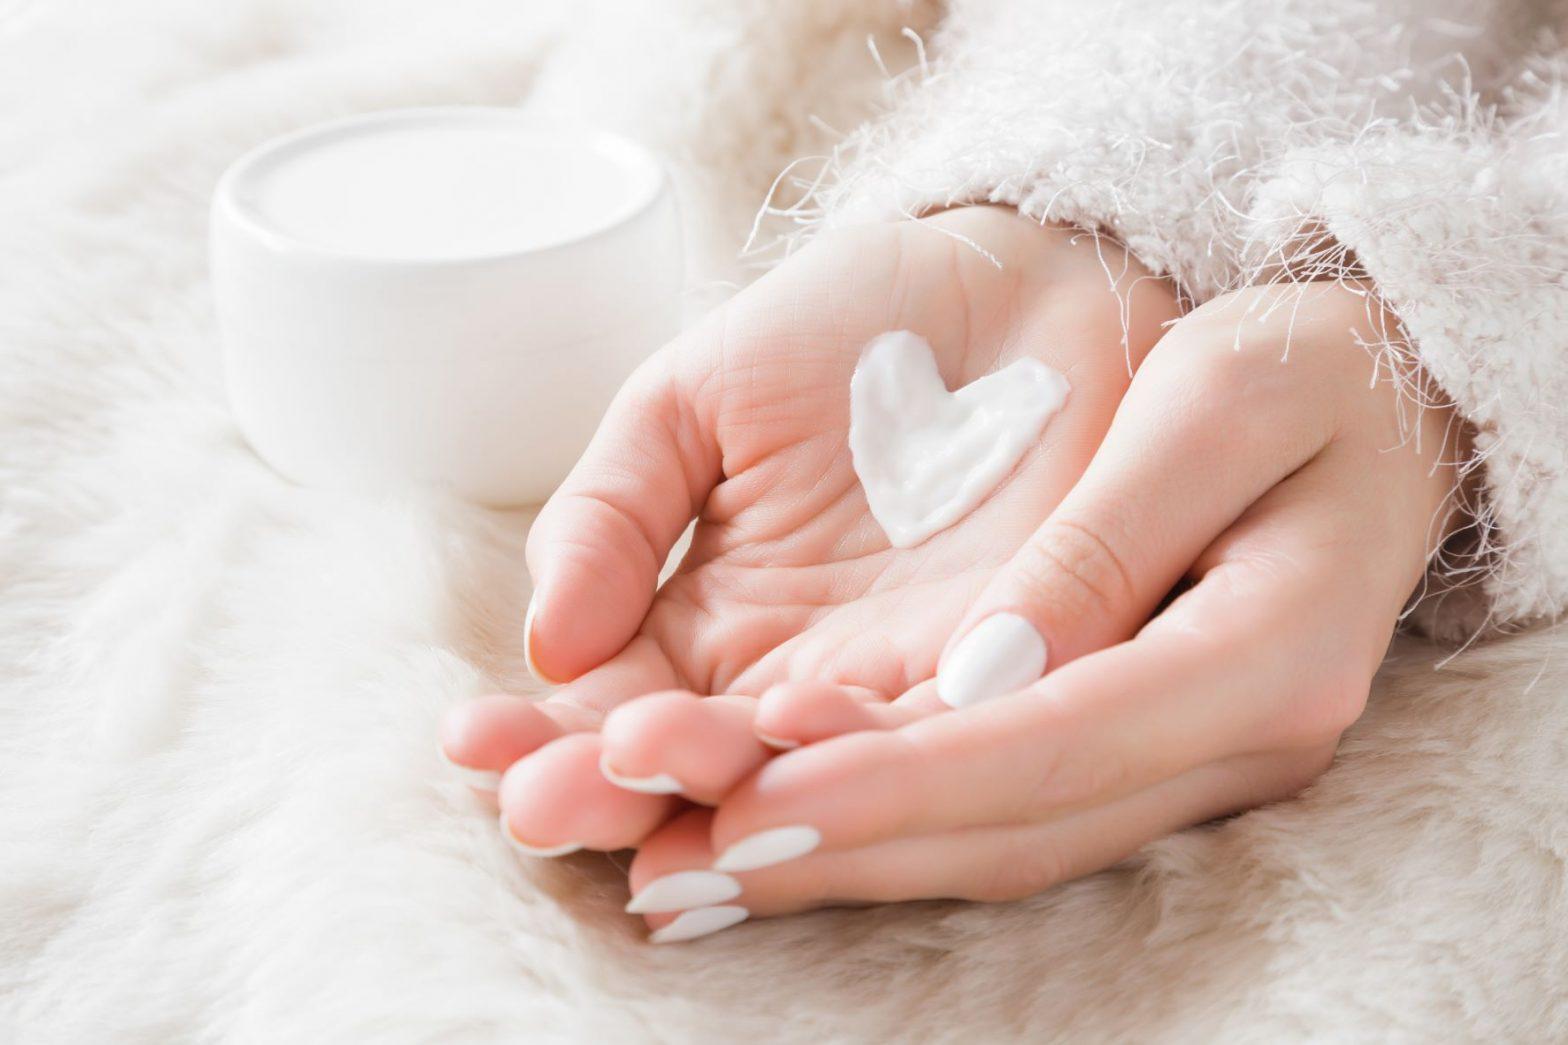 Hands holding skin cream shaped like a heart